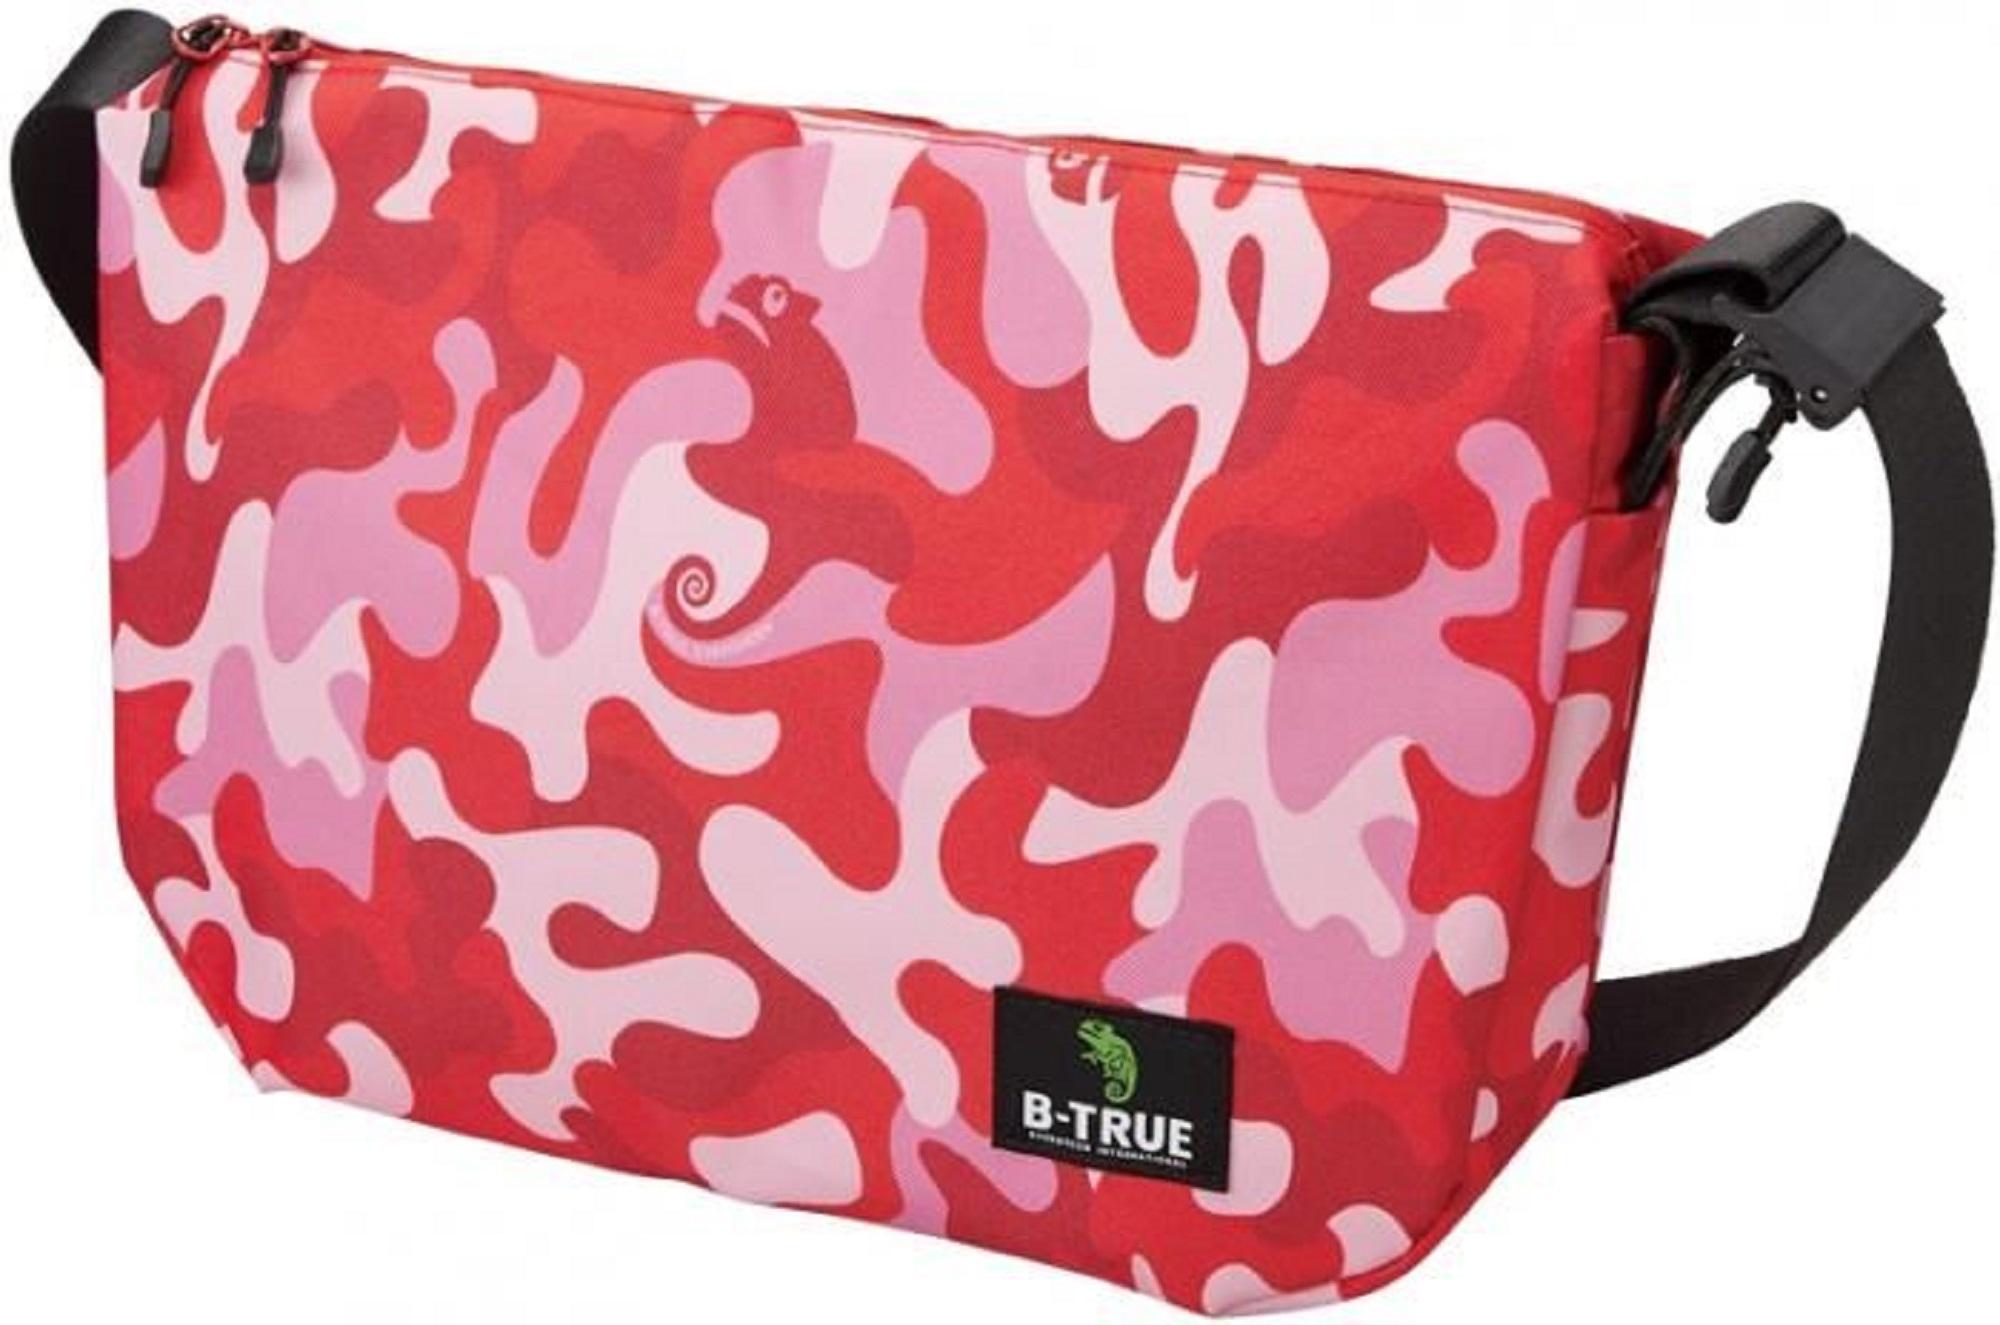 Evergreen Tackle Bag Shoulder B-True Size M Red Camou (0465)